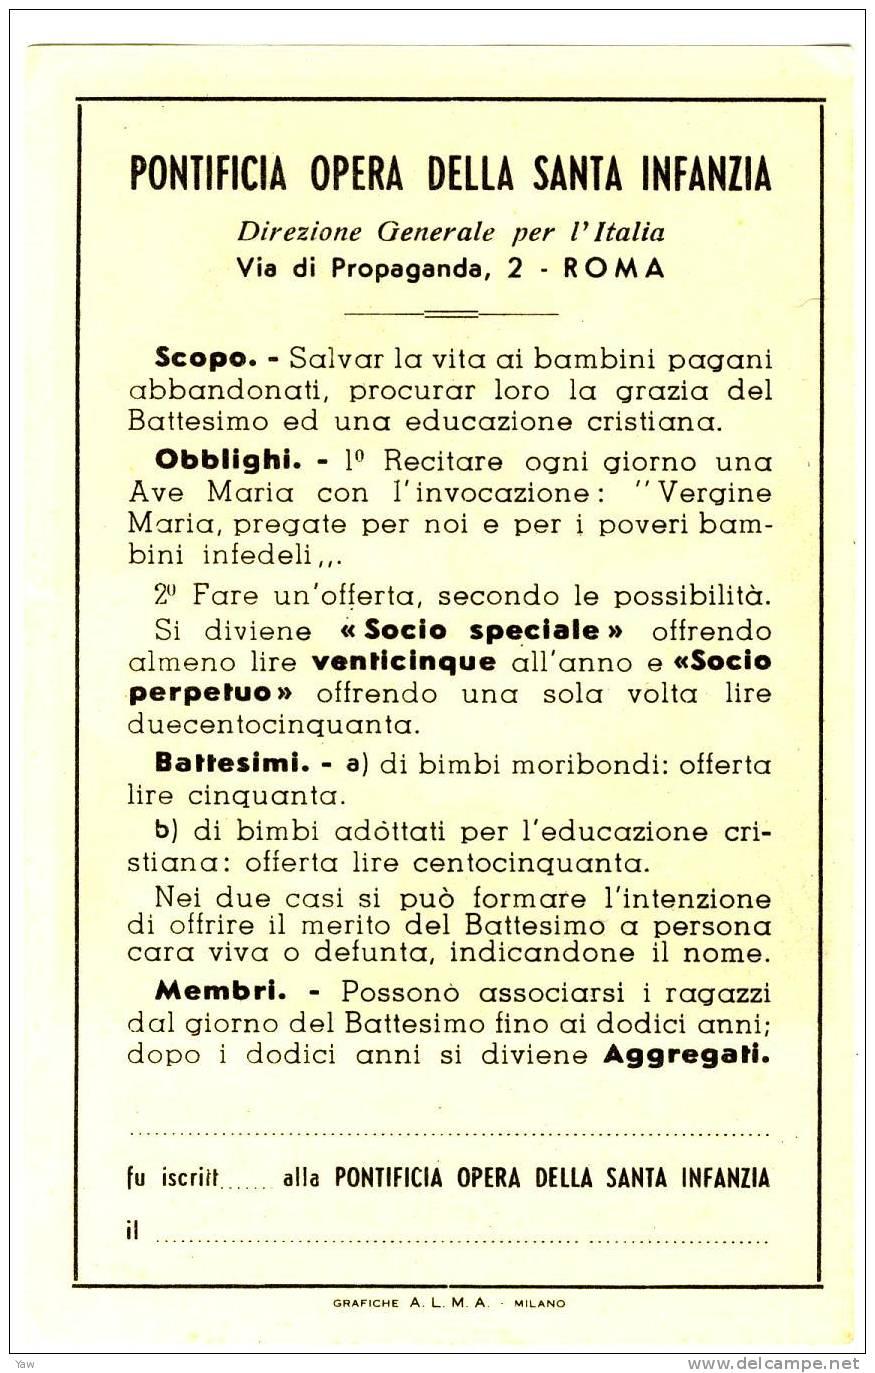 pontificia-opera-santa-infanzia